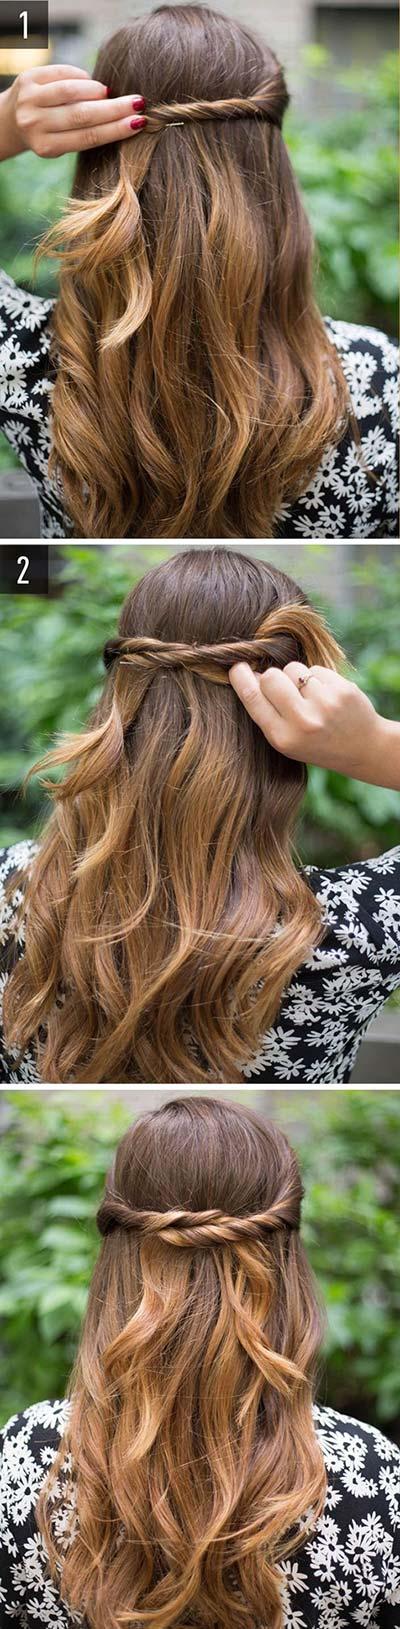 half-up-half-down-hairstyles-3